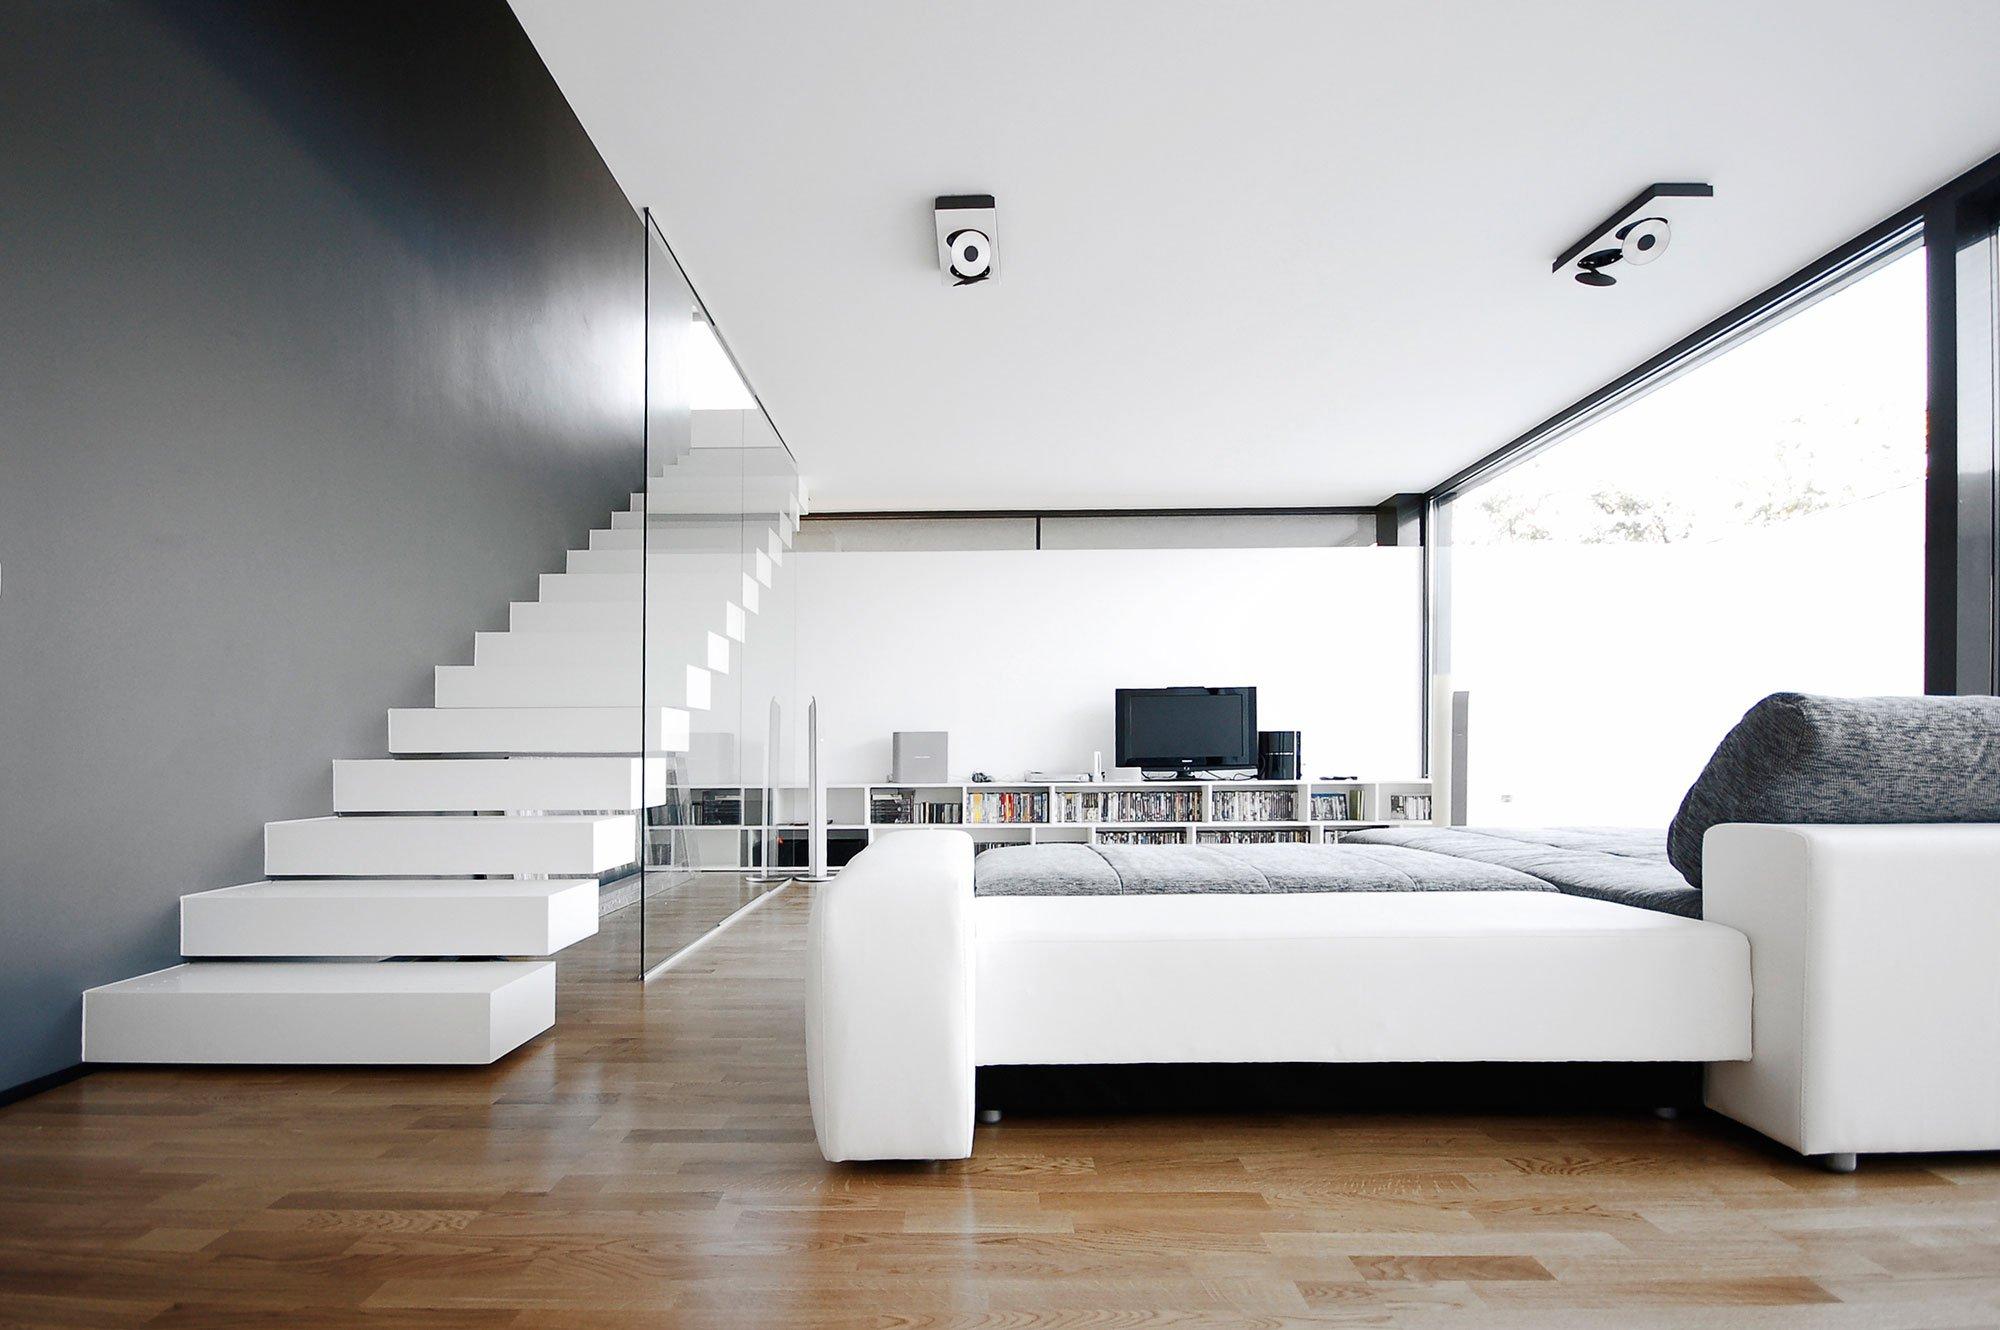 Dise o de casa moderna de dos plantas construye hogar for Simple modern house interior